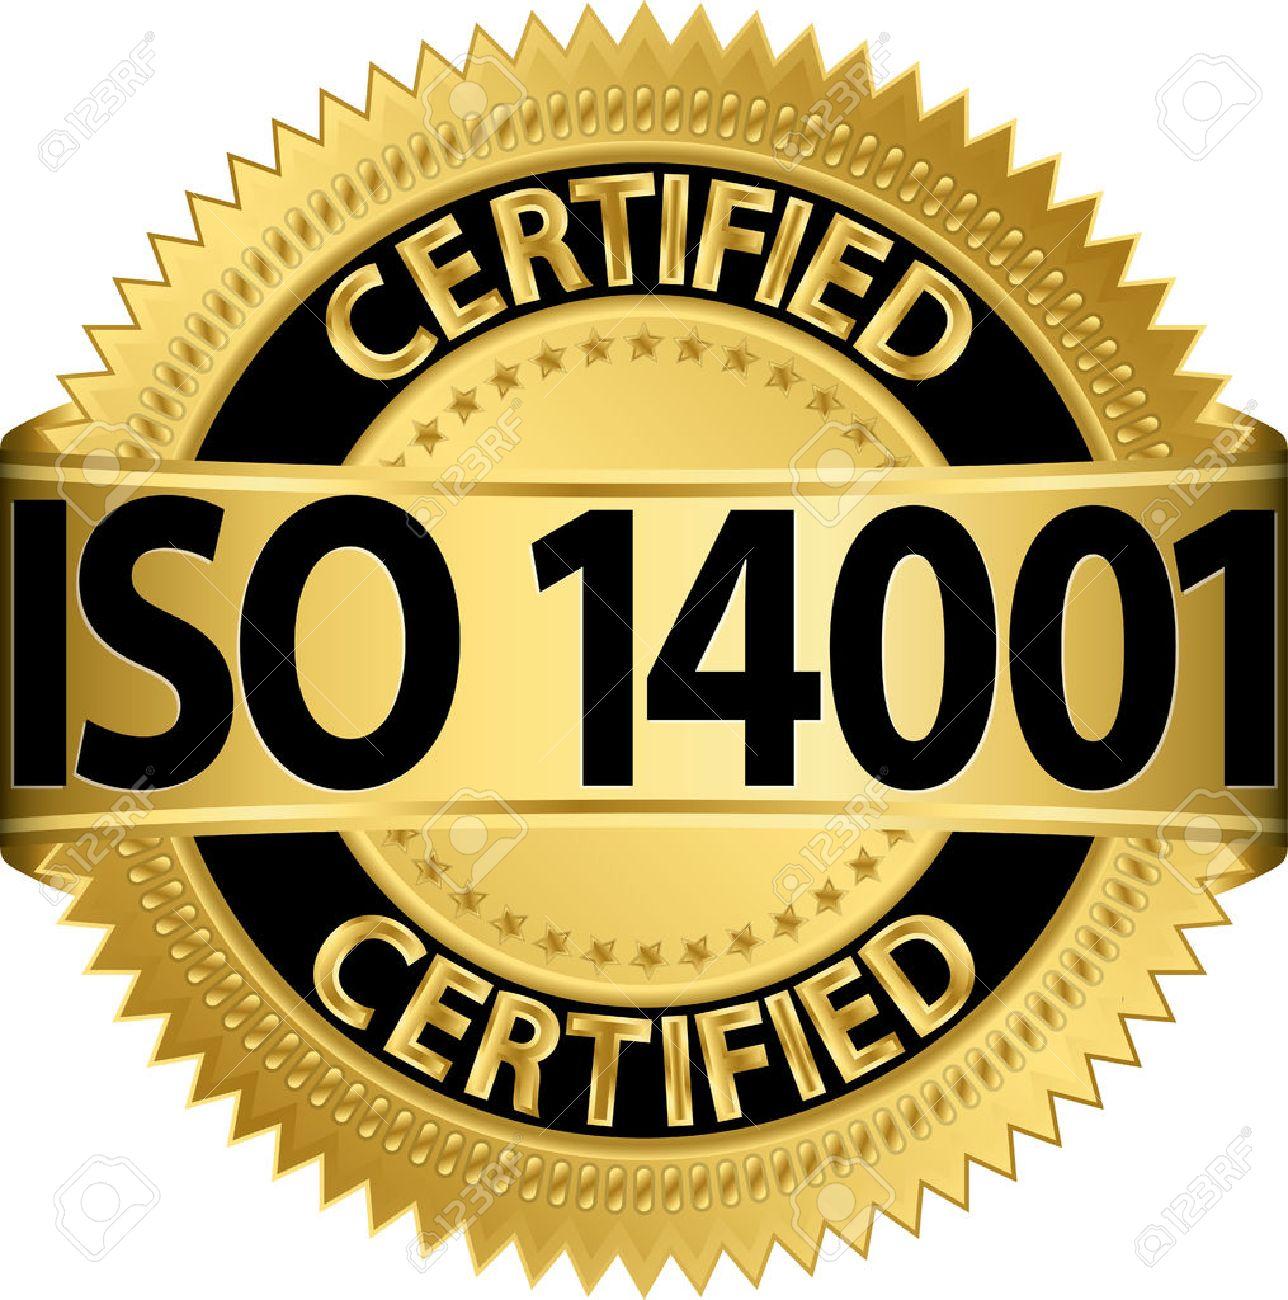 ISO 9001 Certification RegistrationISO 9001 Certification Registration